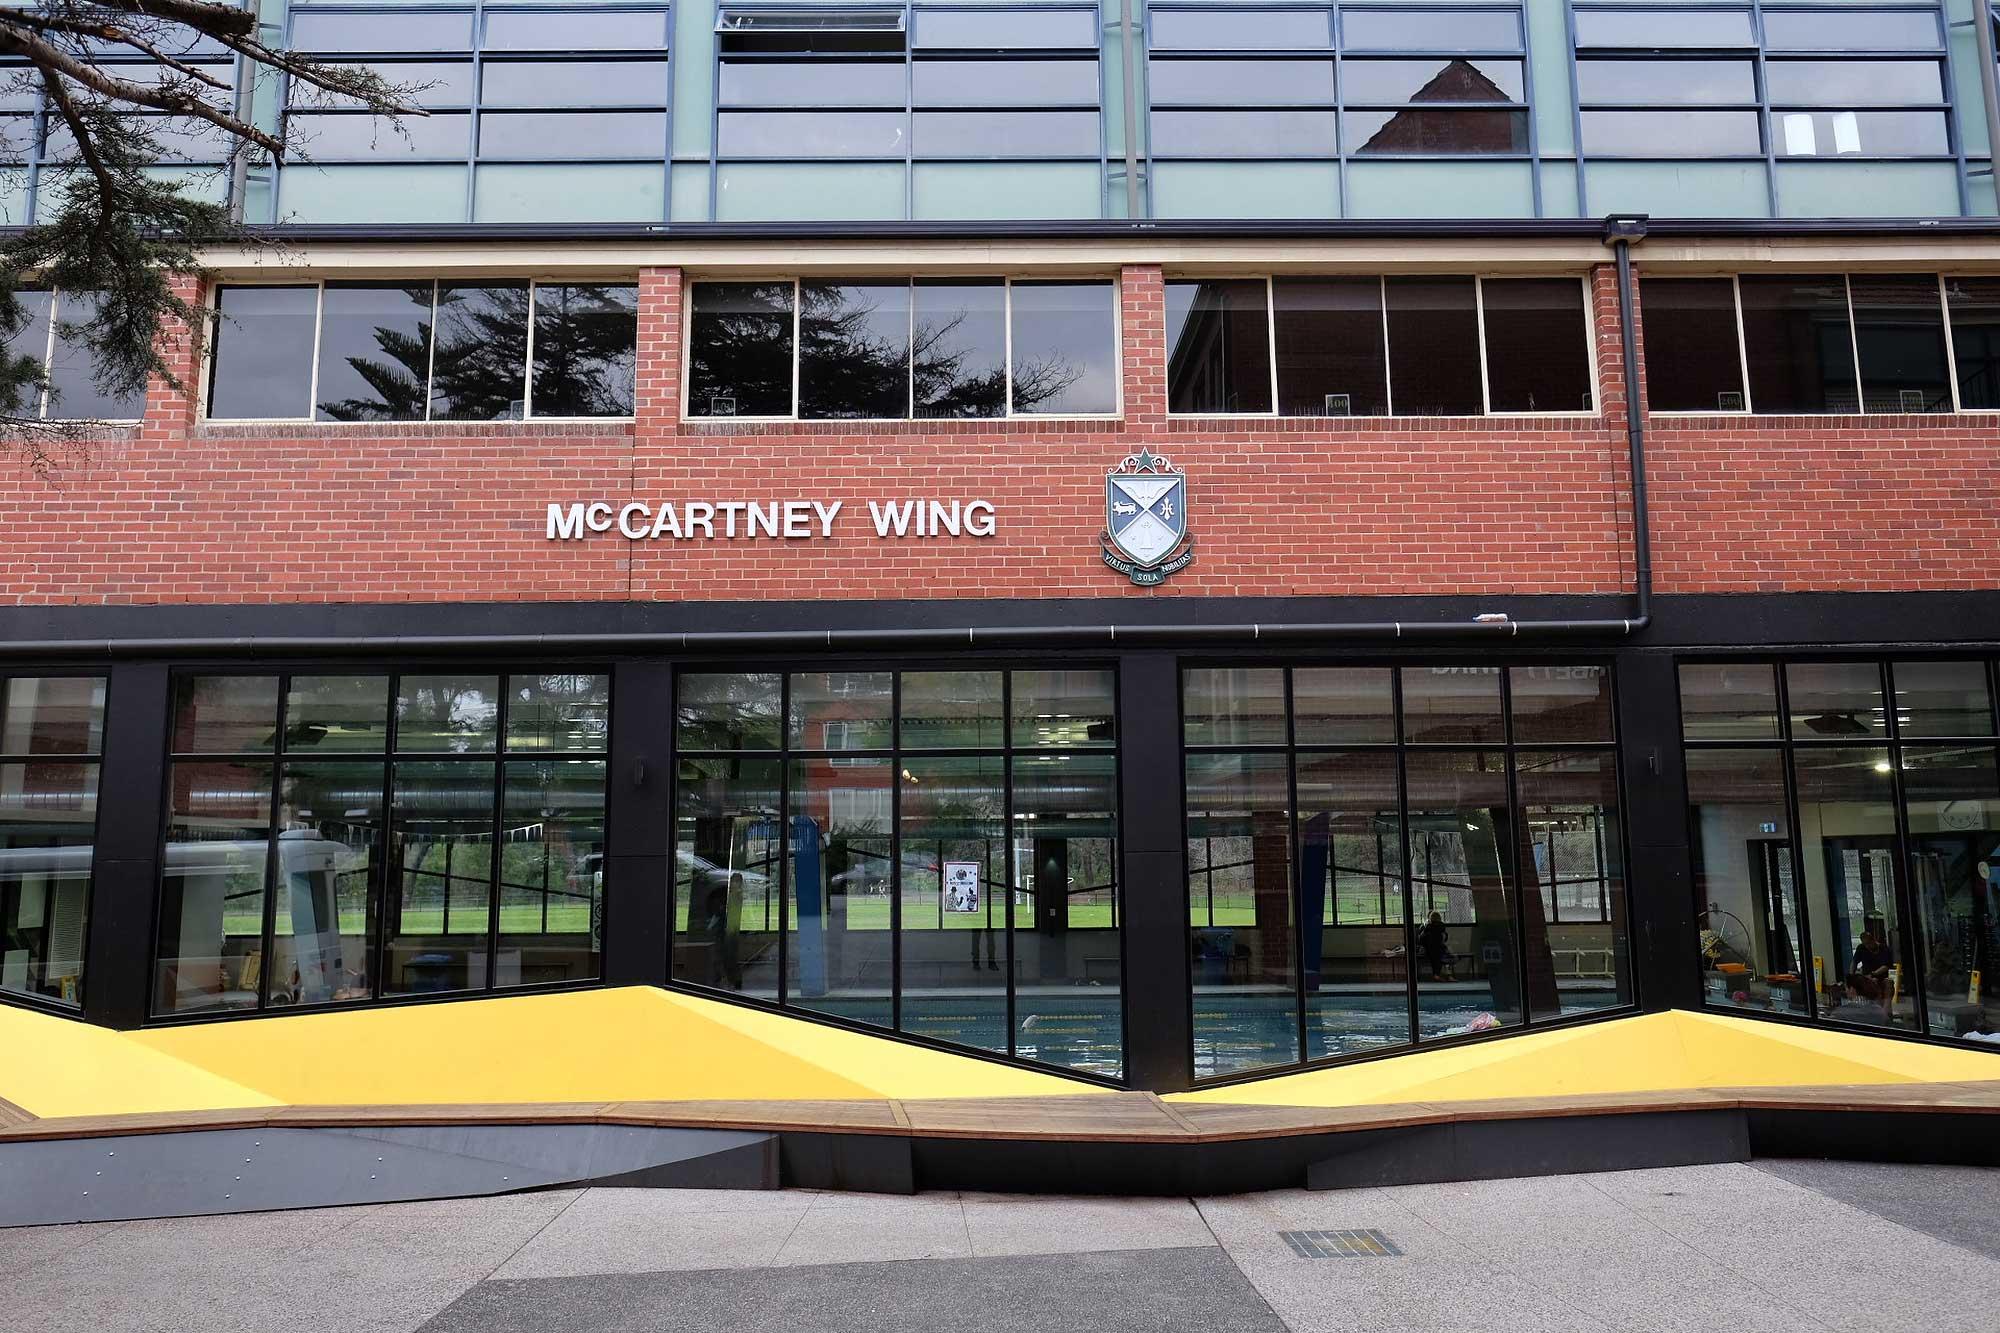 McCartney Wing